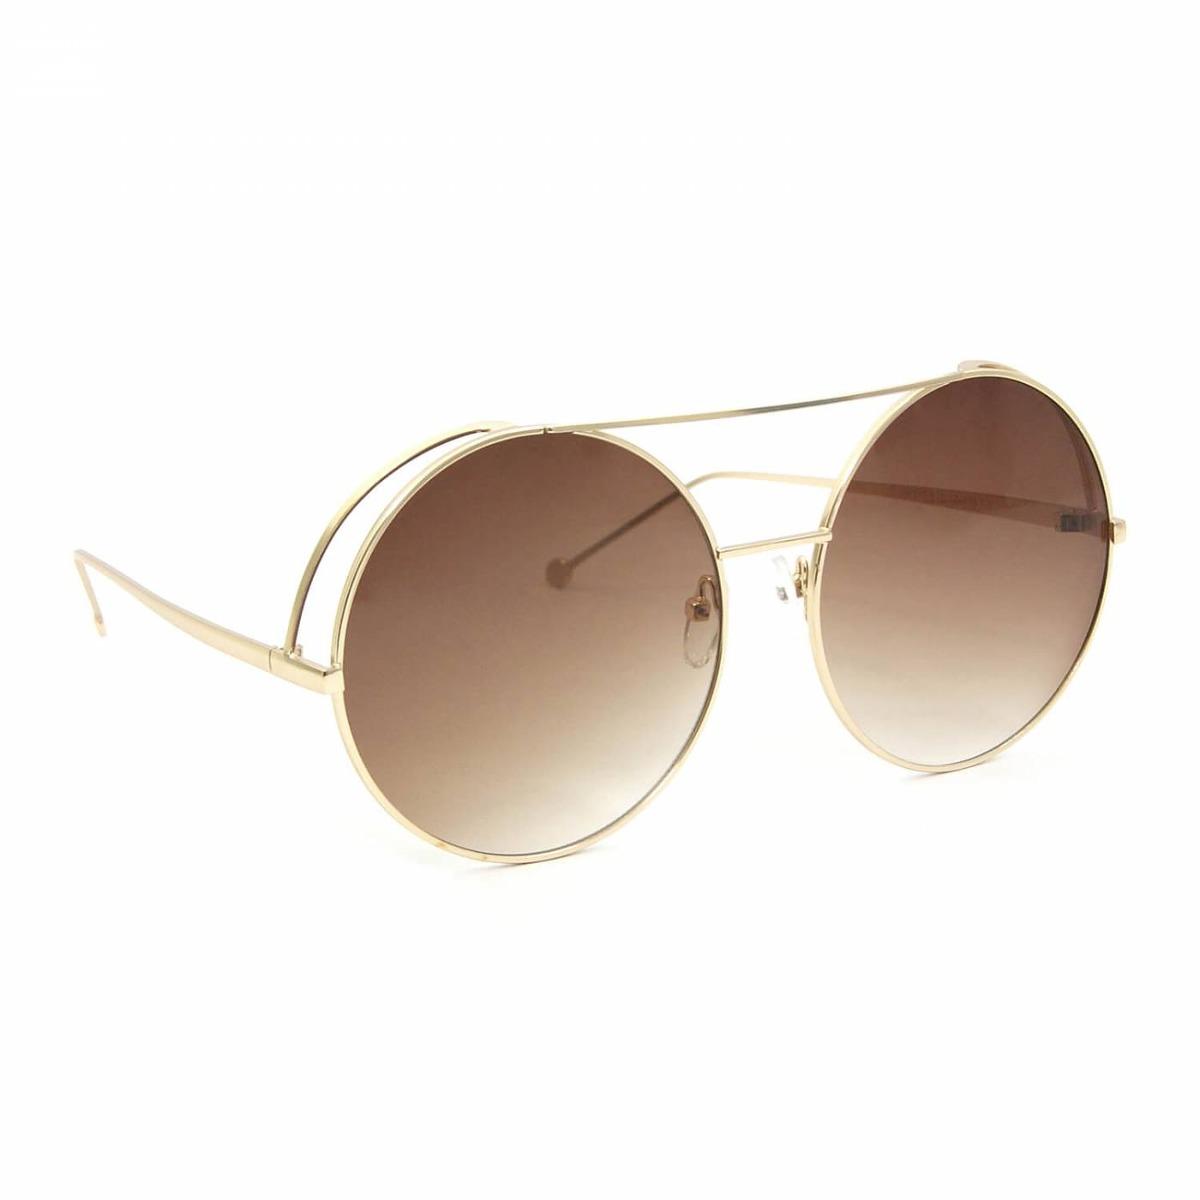 236ddd596 Óculos De Sol Top Bar Redondo Marrom - R$ 95,12 em Mercado Livre